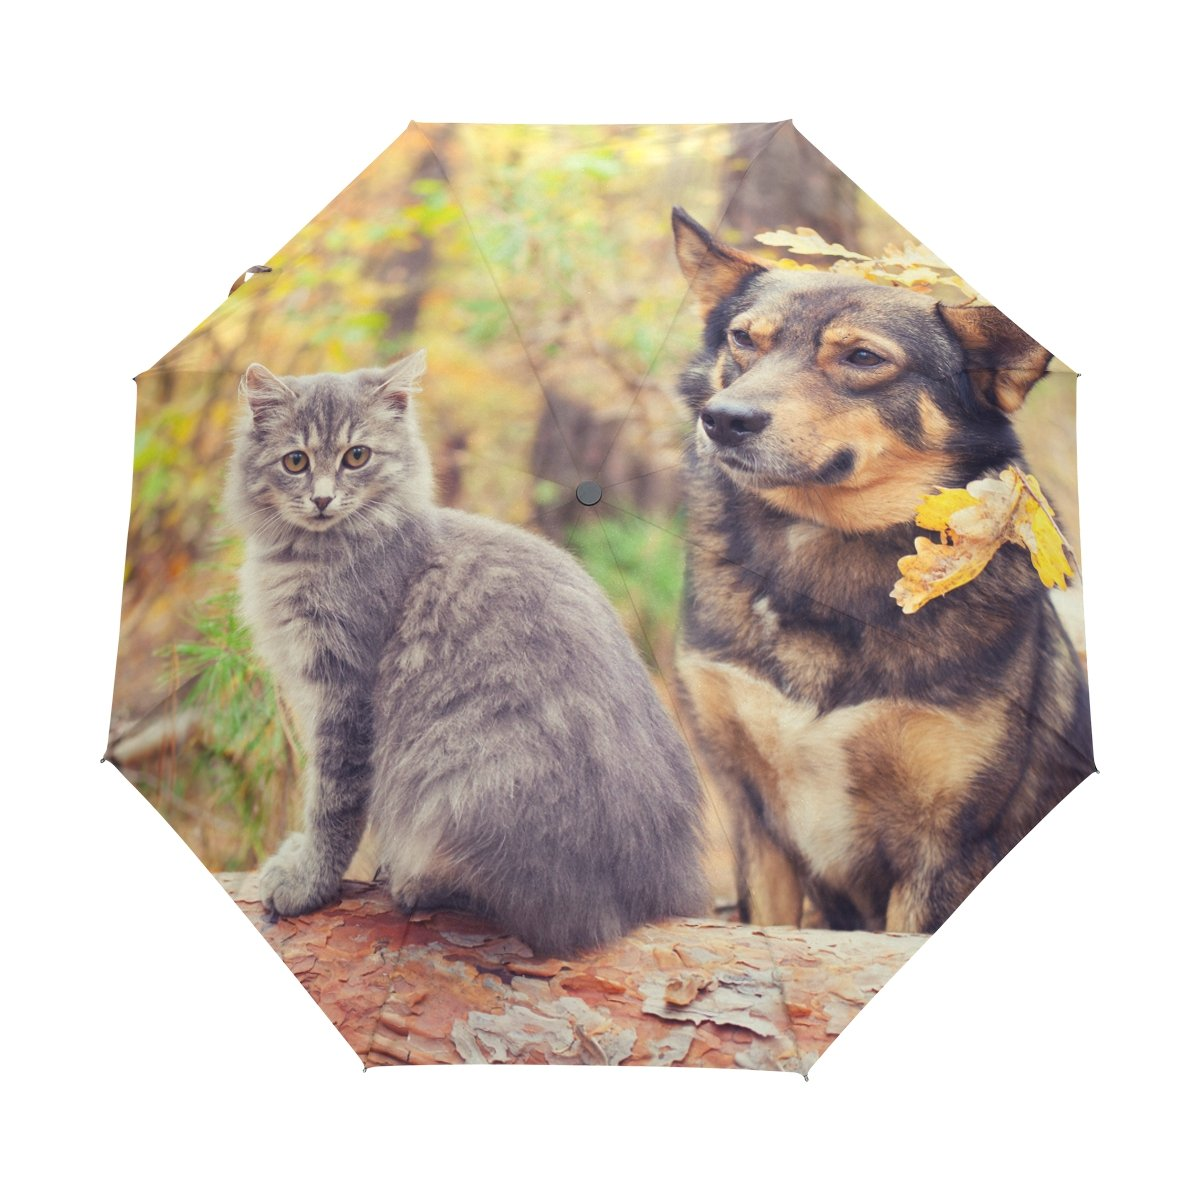 Senya Saobao防風と防雨トラベル傘with自動開いて閉じ折りたたみ犬と猫Best Friends座っているTogetherポータブル折りたたみ式太陽雨傘 B07FLYPKLG